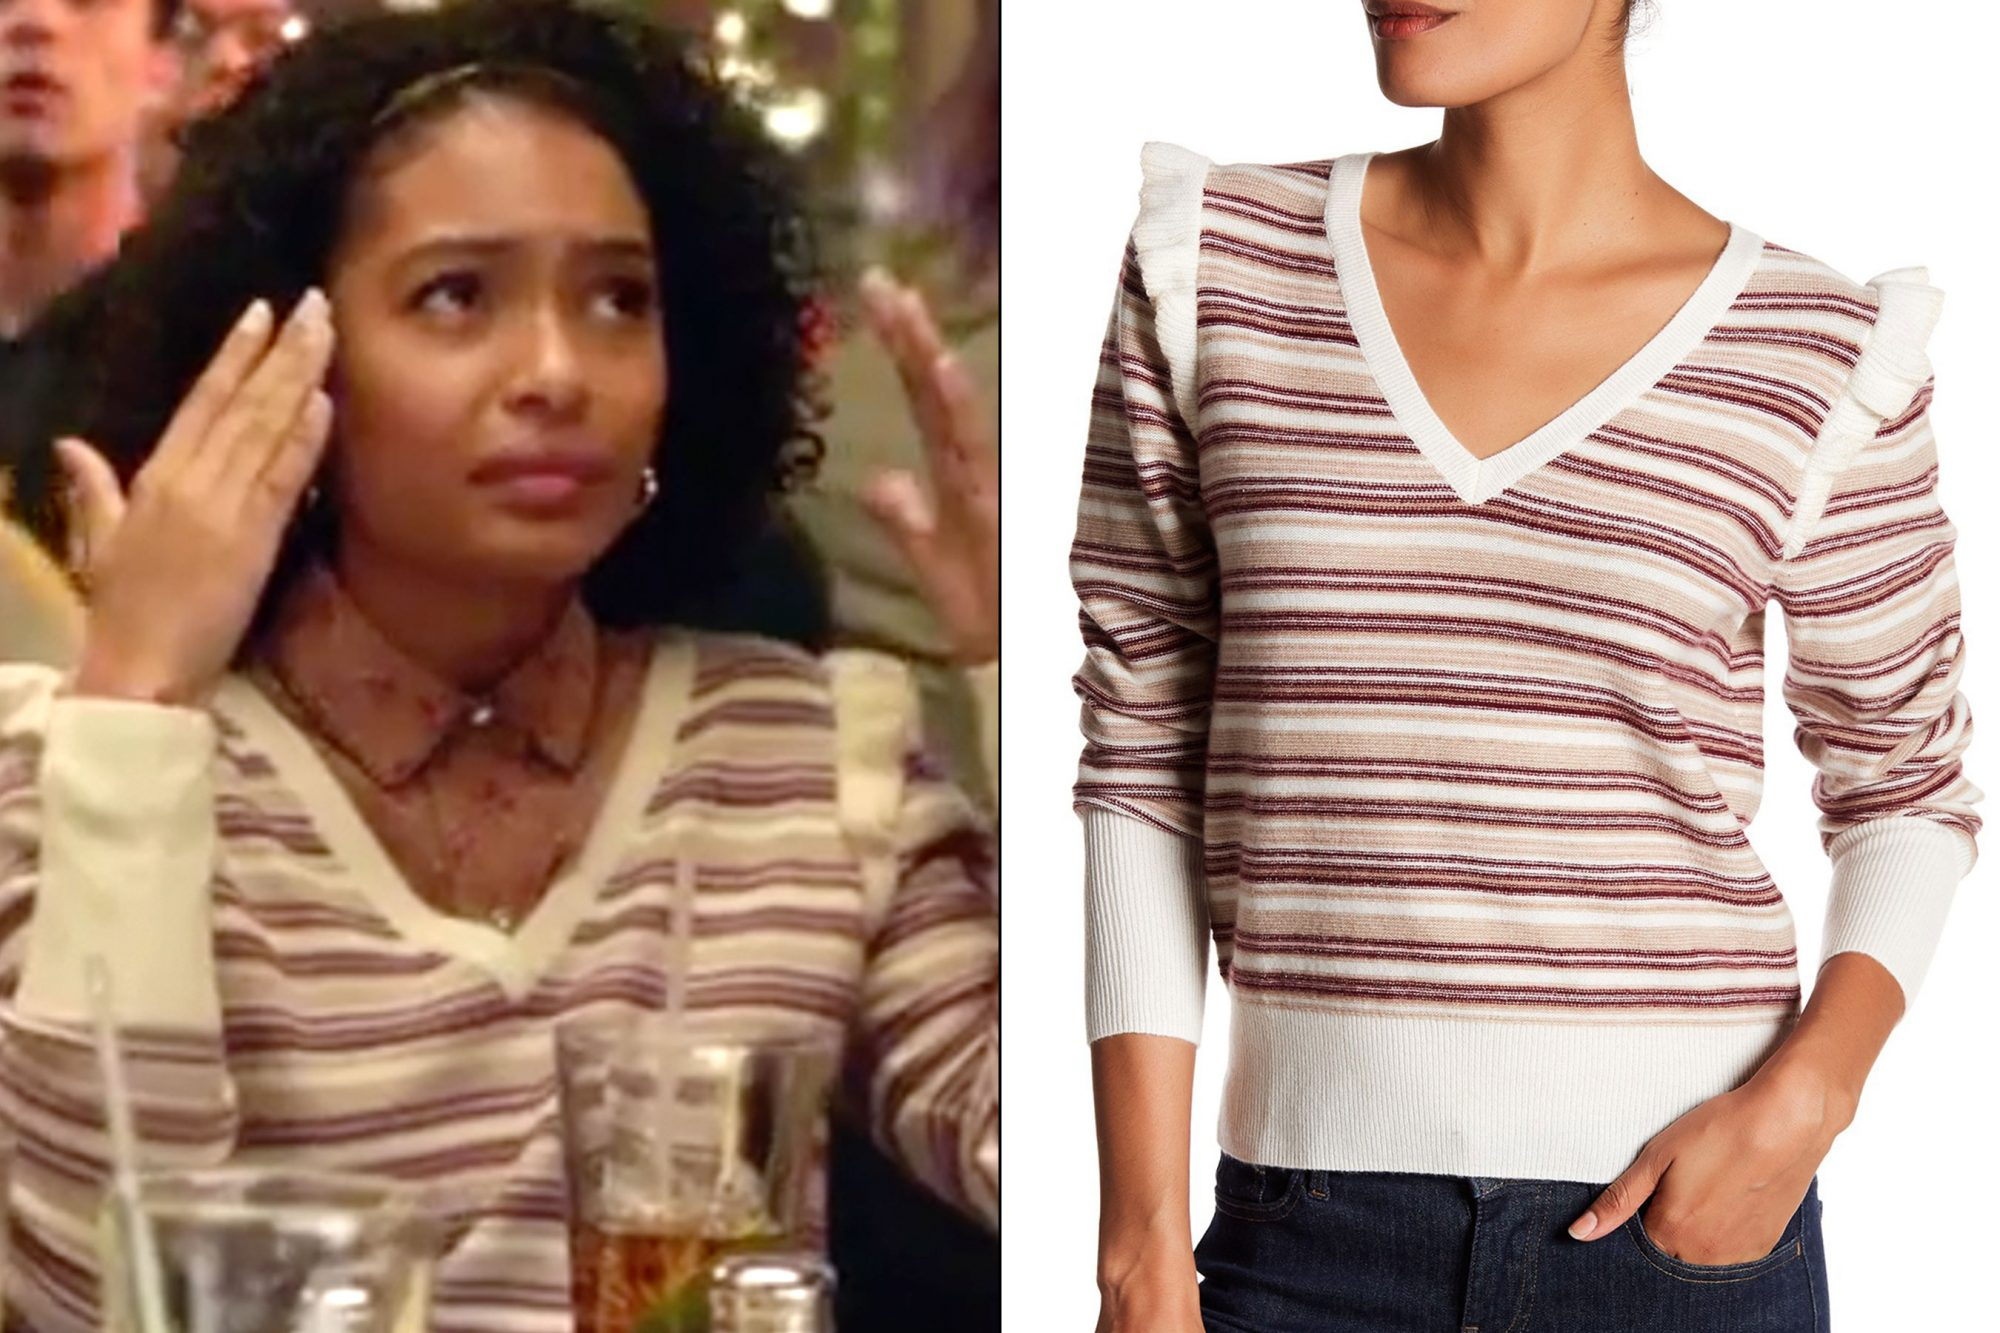 Zoey's (Yara Shahidi) striped sweater on Grown-ish